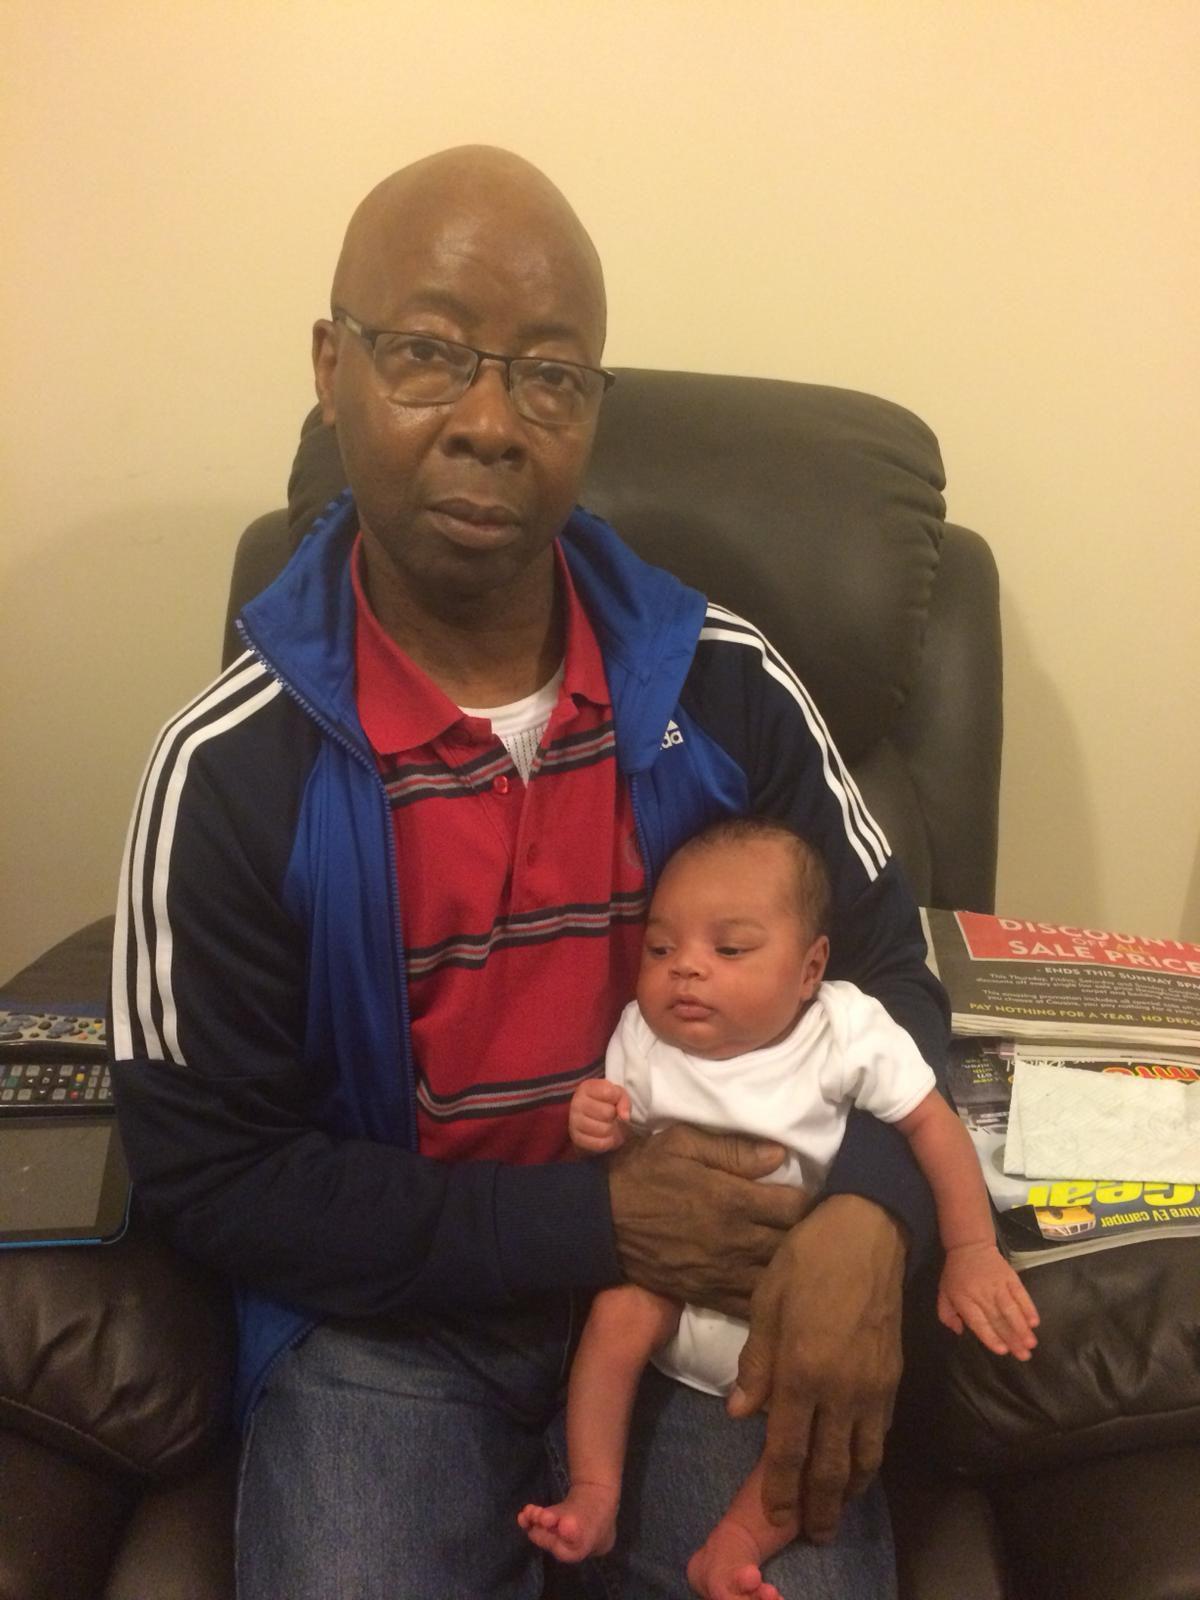 Michael Willis and baby O'Shea M